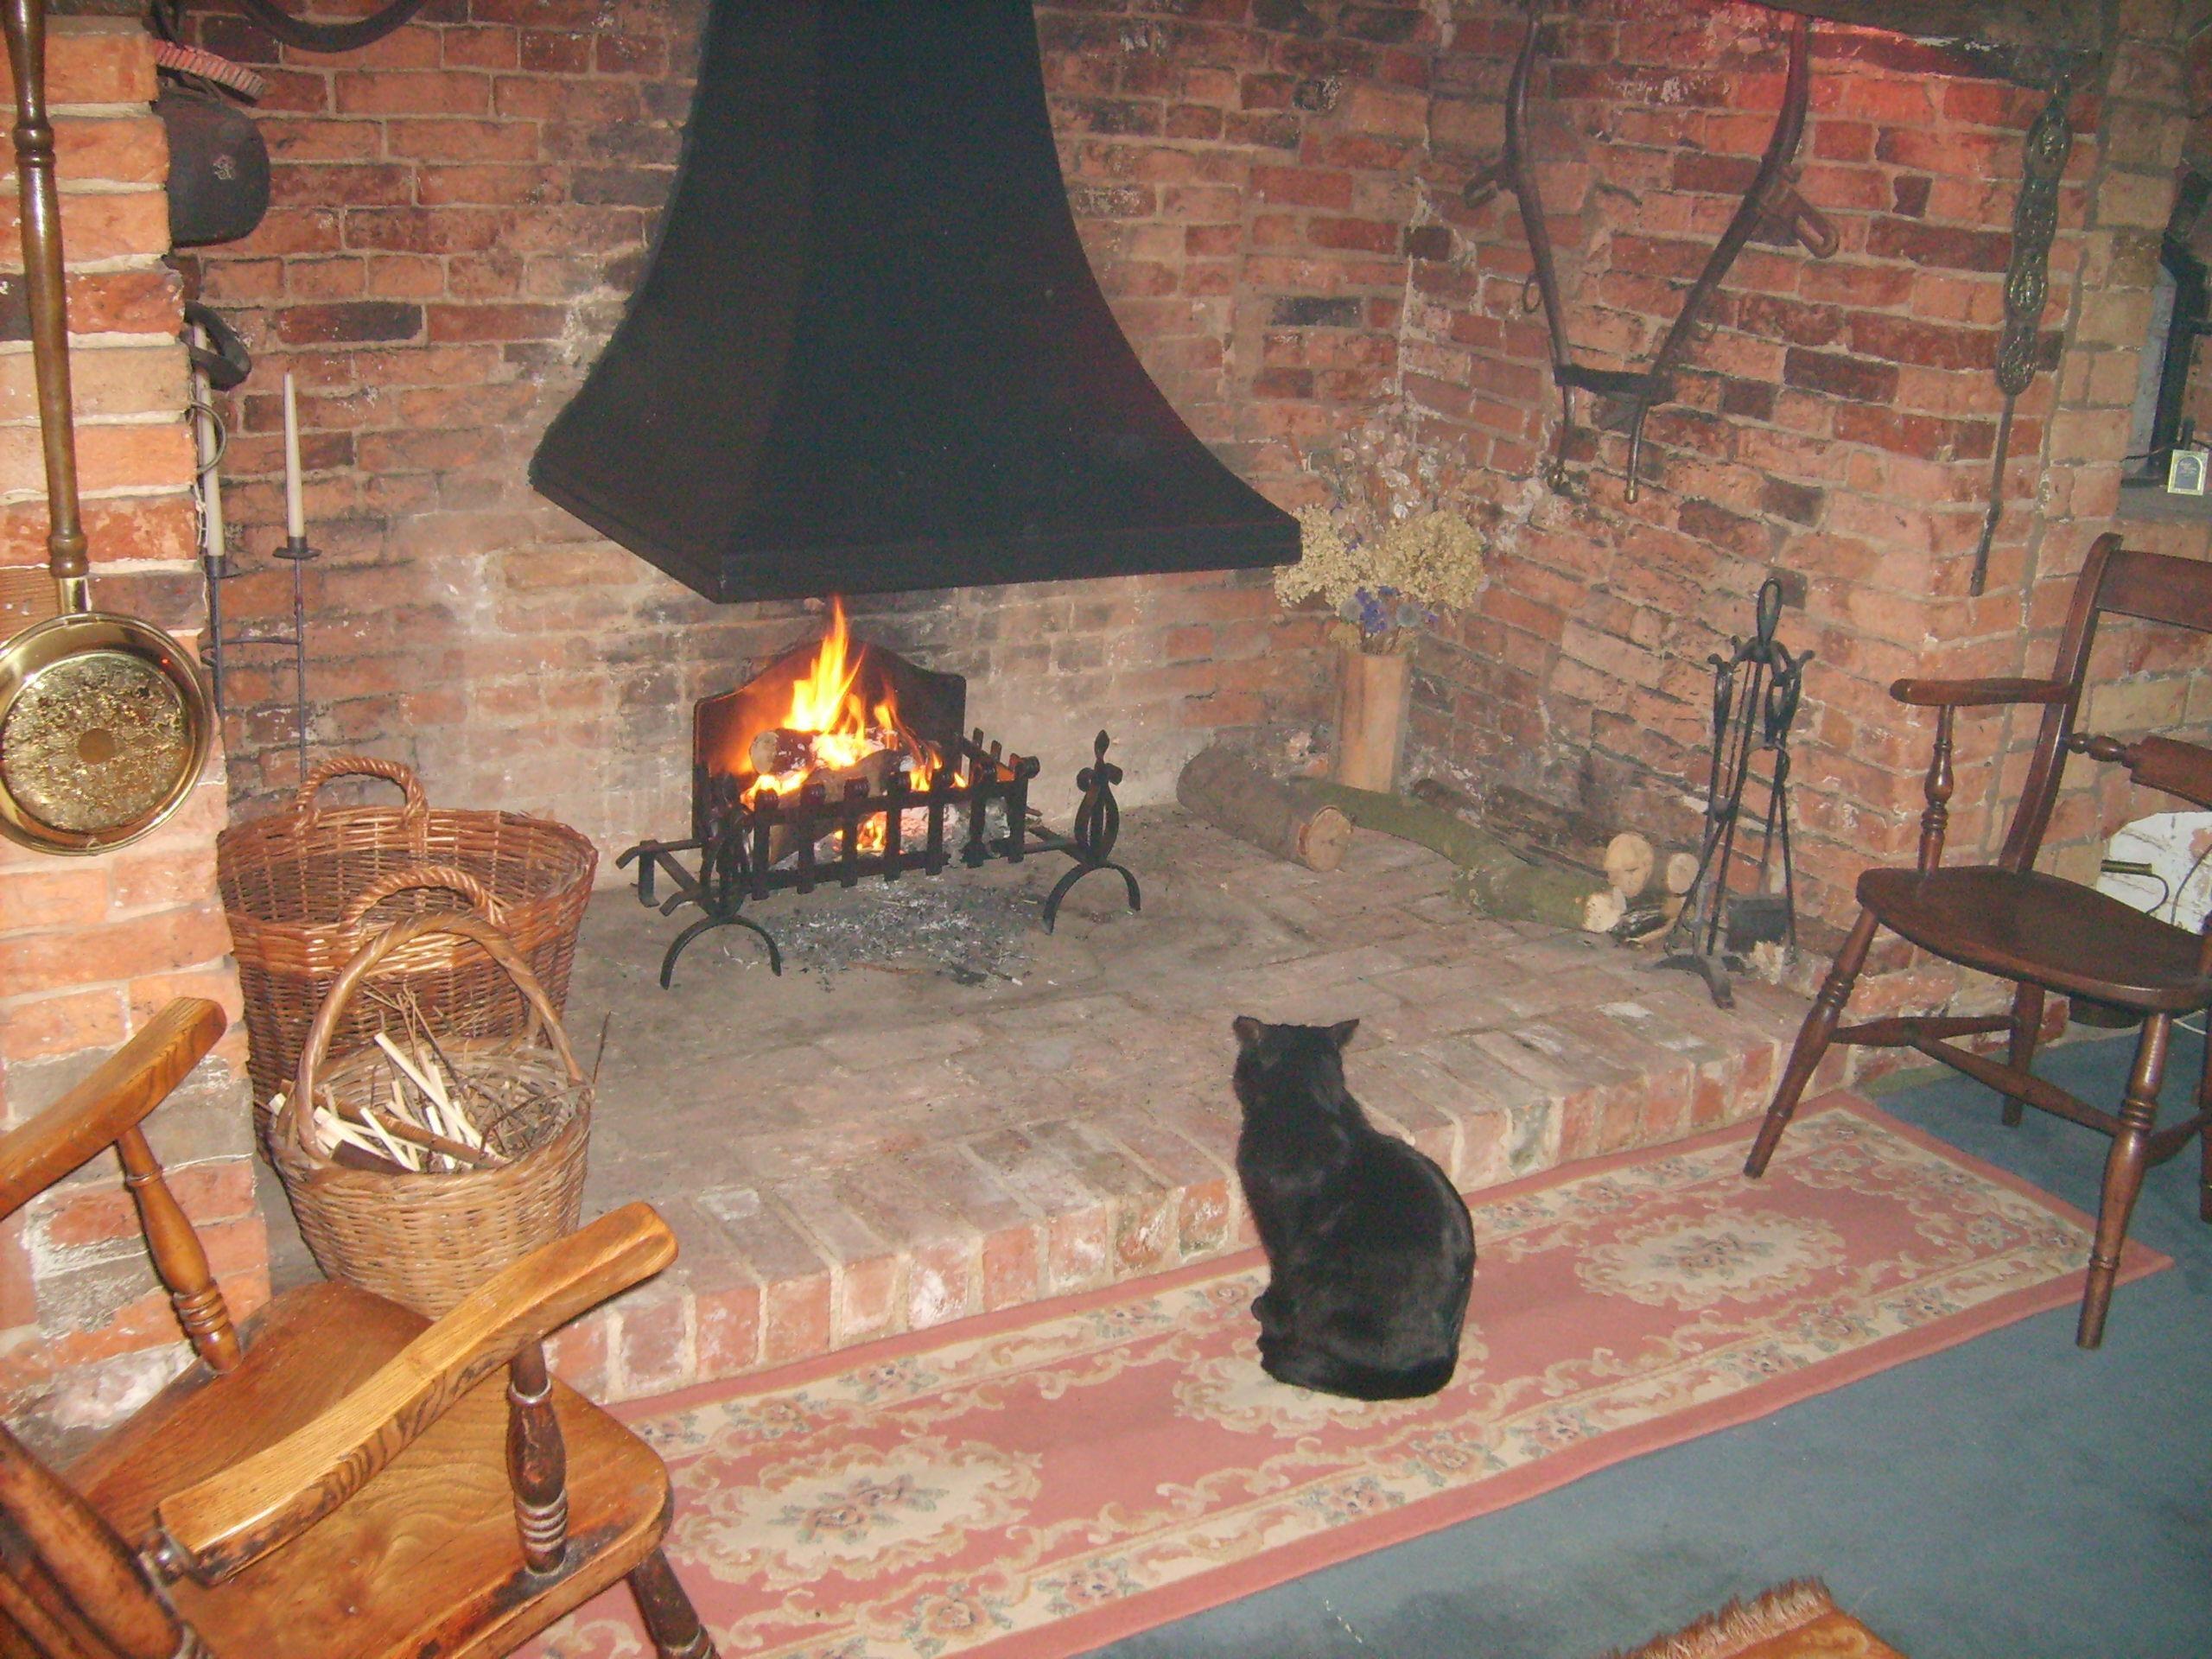 inglenook fireplace canopies Fireplaces Pinterest Inglenook